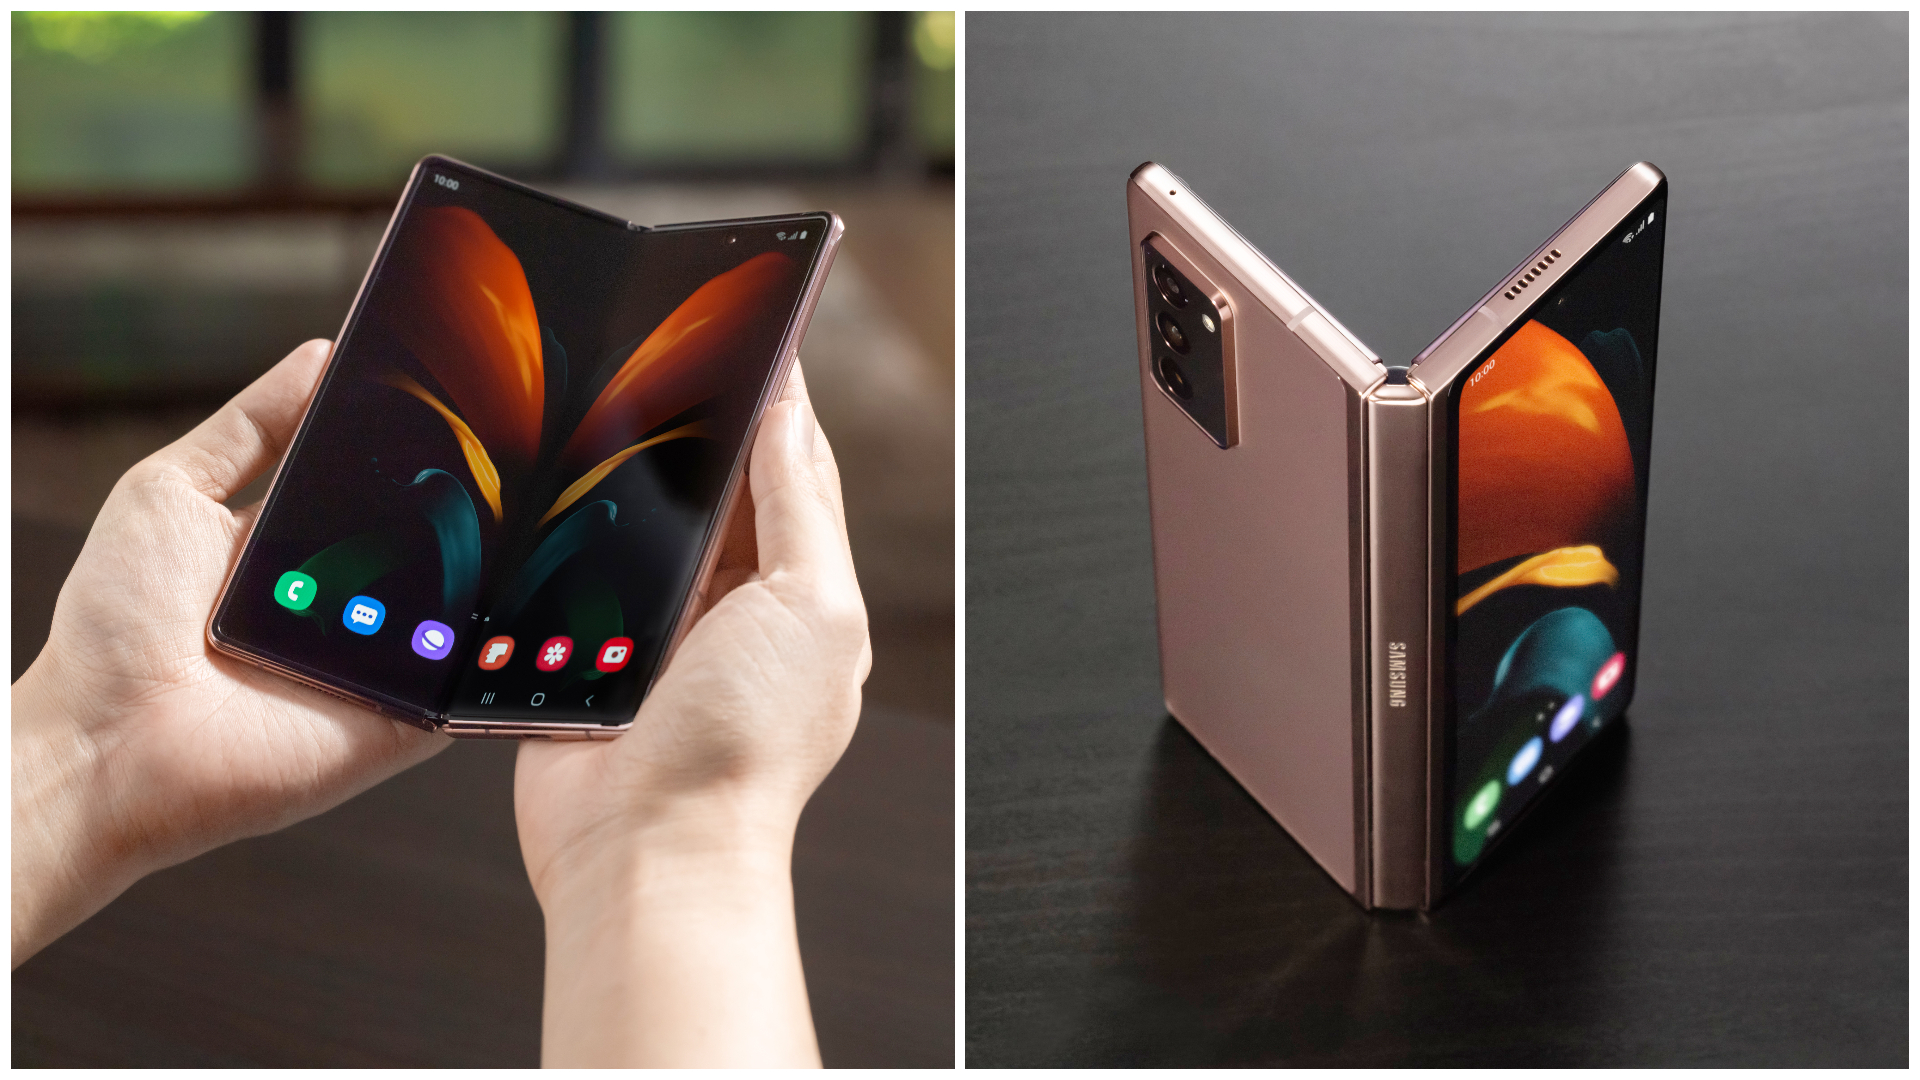 Samsung Galaxy Z Fold 2 now official | Sugbo.ph - Cebu